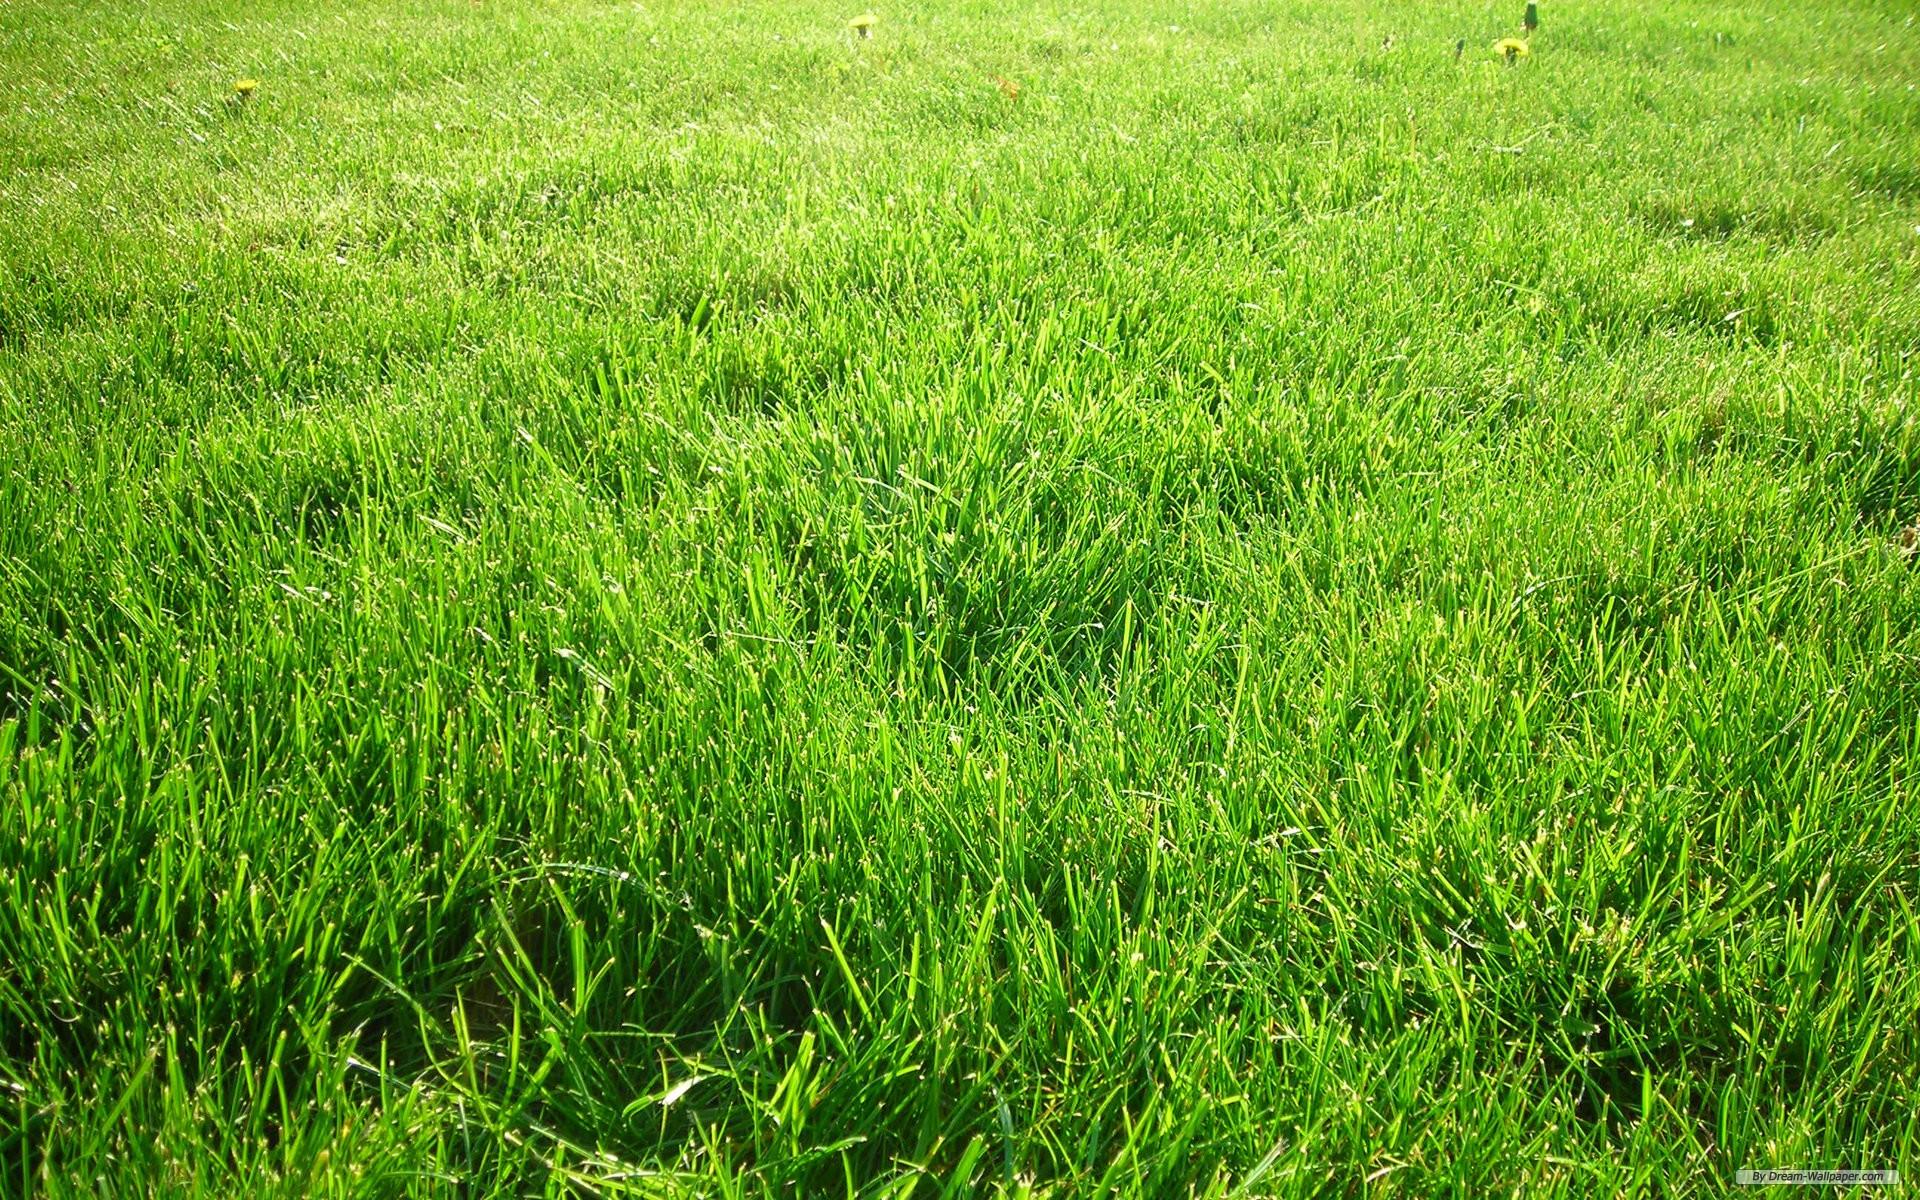 Free Nature Wallpaper Green Grass Wallpaper for PC